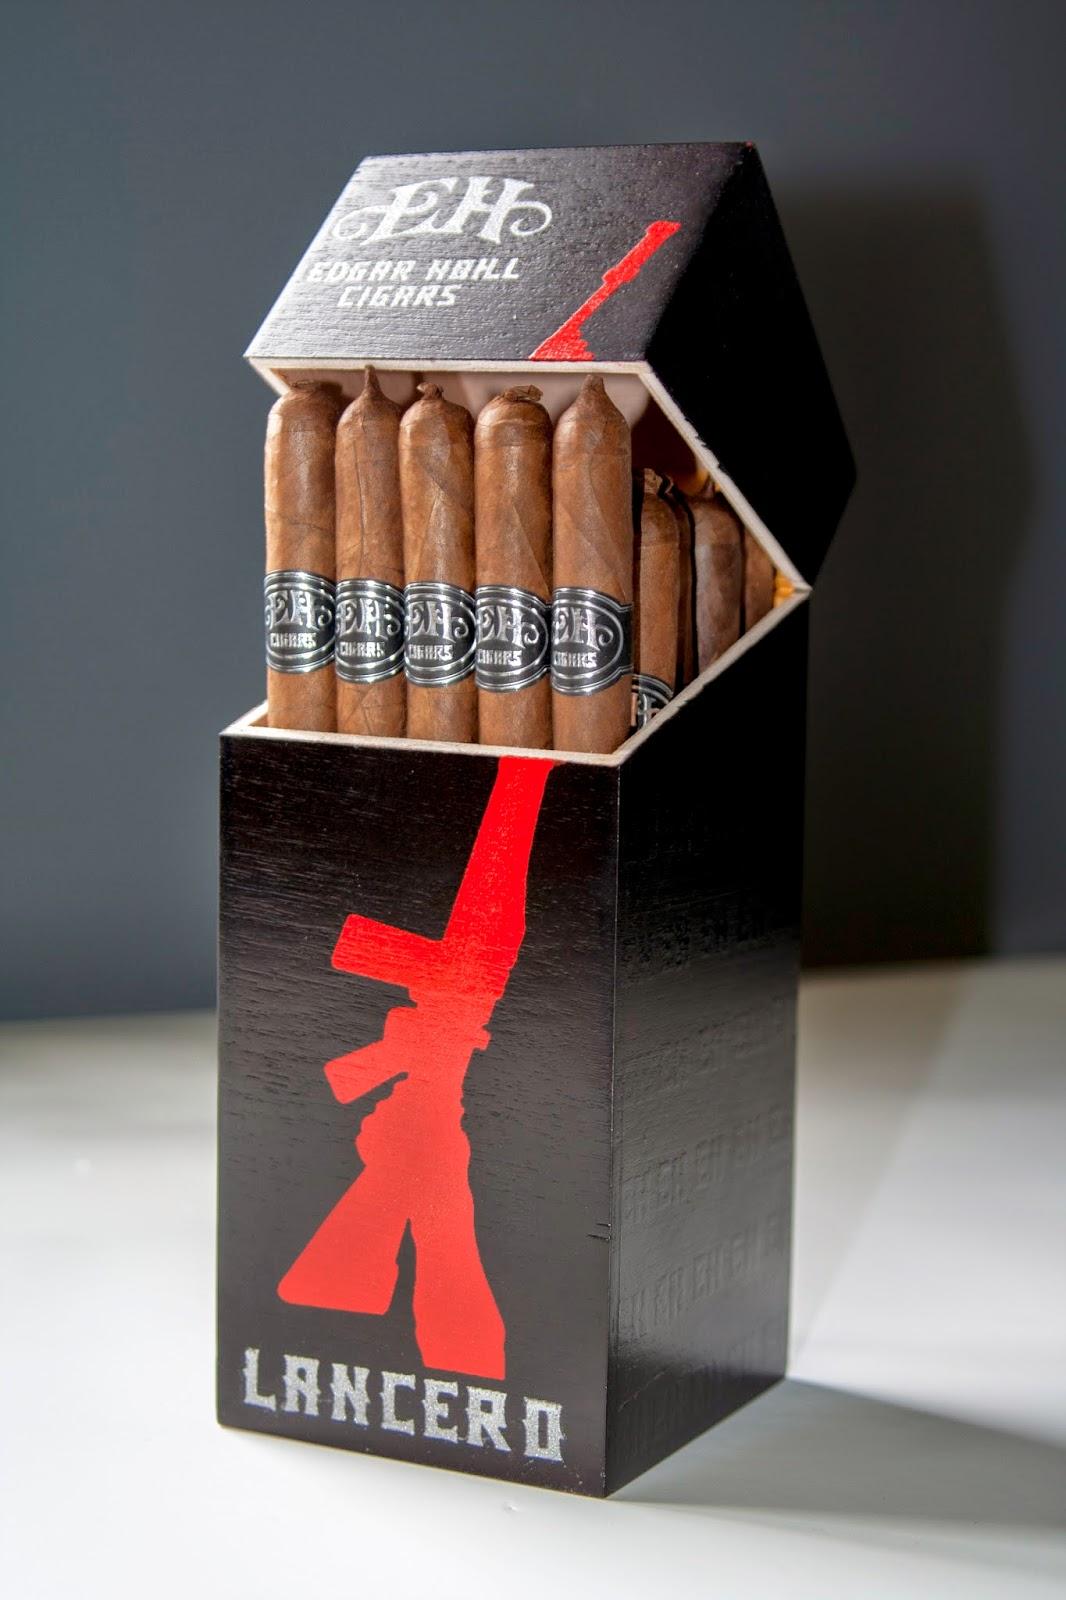 Cigar News: EH Lancero by Edgar Hoill Cigars (2014 Preview)